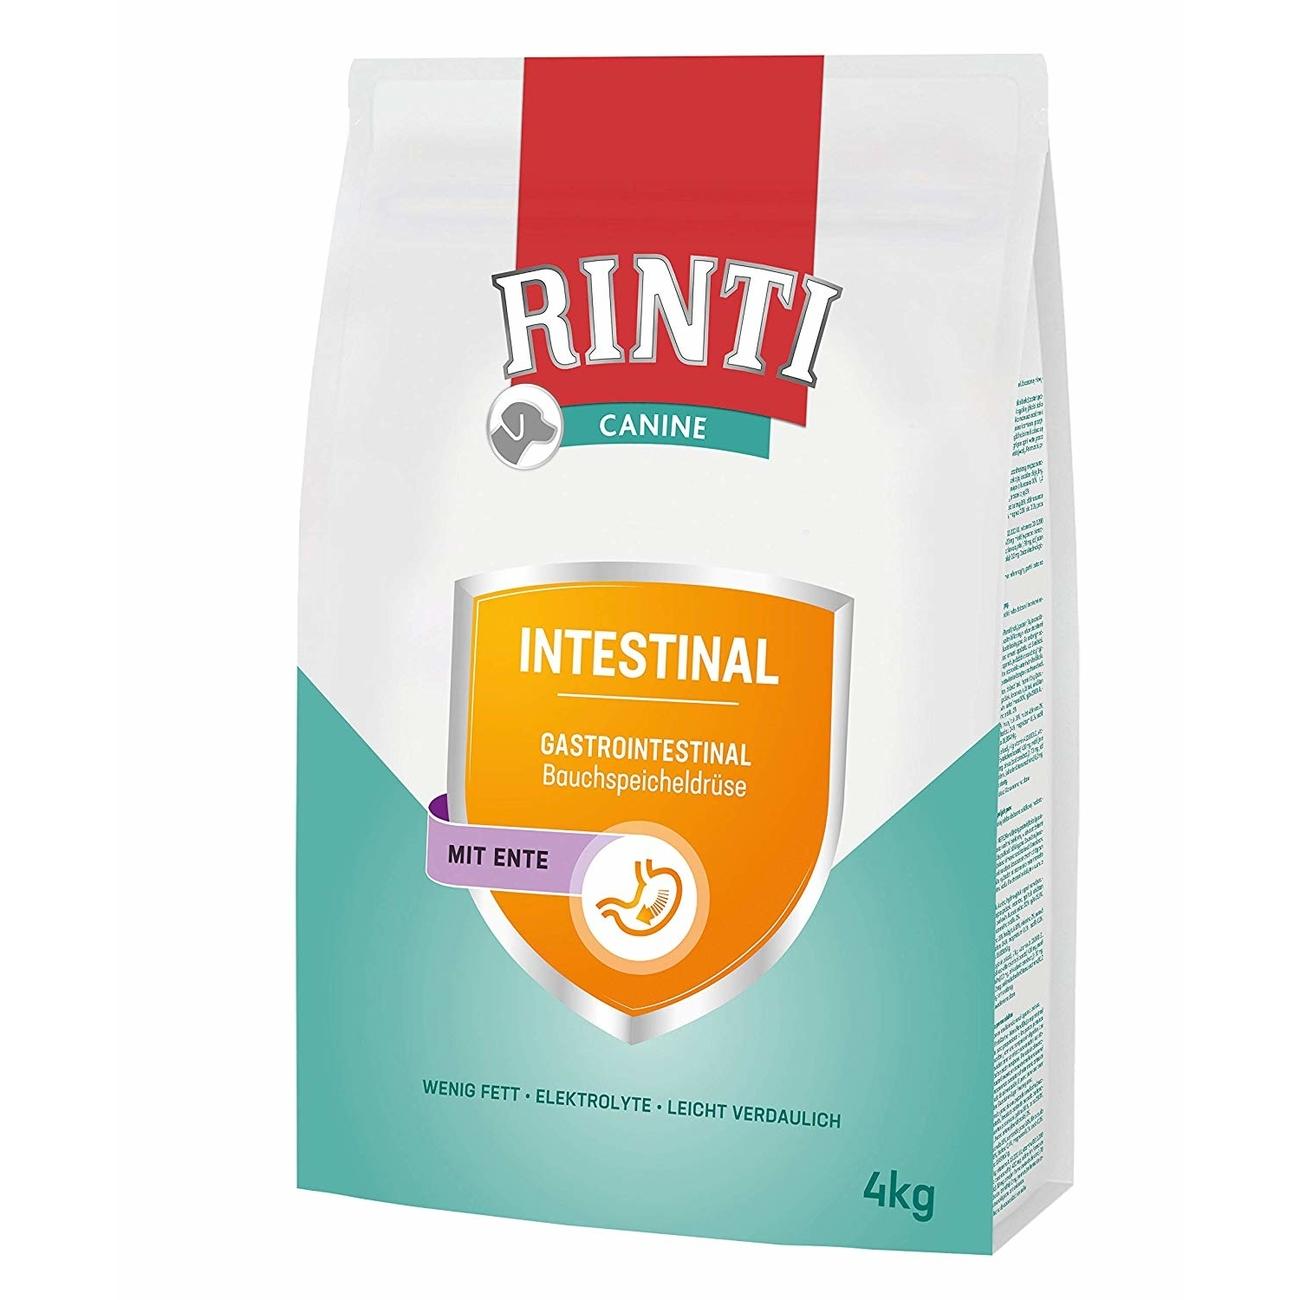 Rinti Canine Intestinal Diätfutter für Hunde, Bild 2